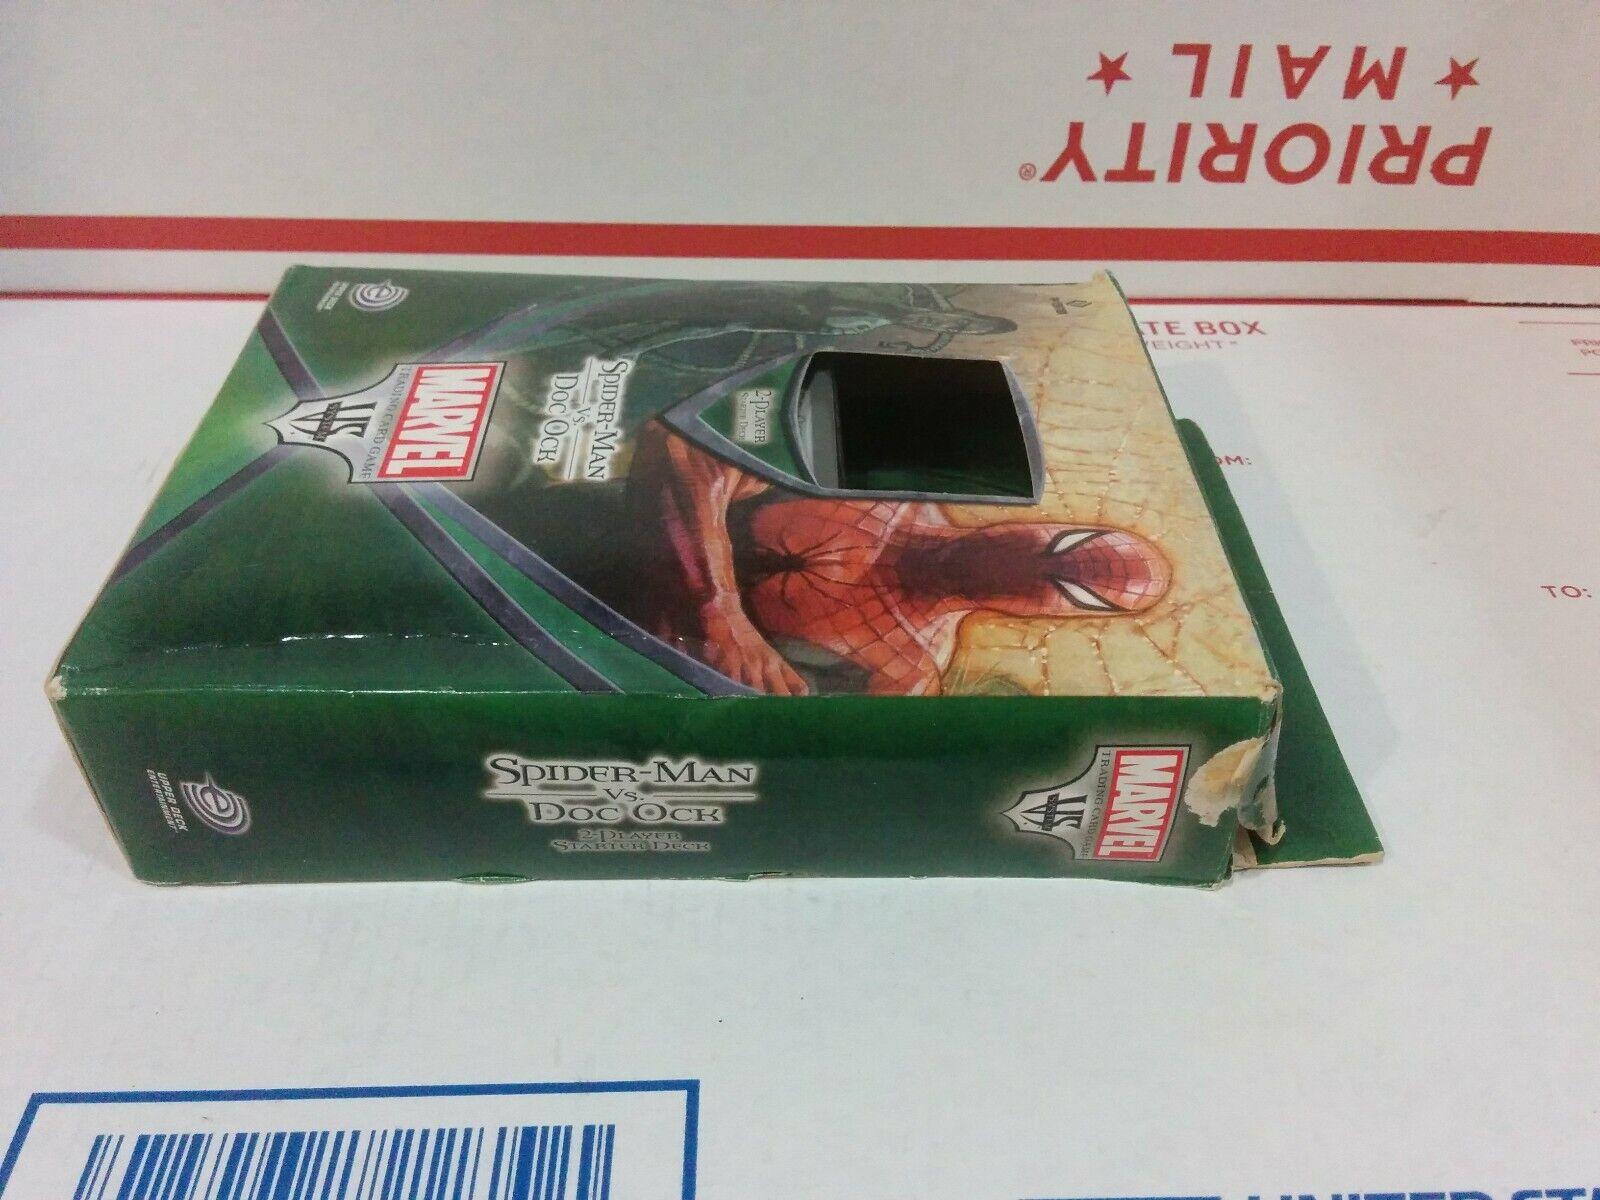 System Spiderman Vs Vs Doc Ock 1ST Ed Sealed Box 6 Decks